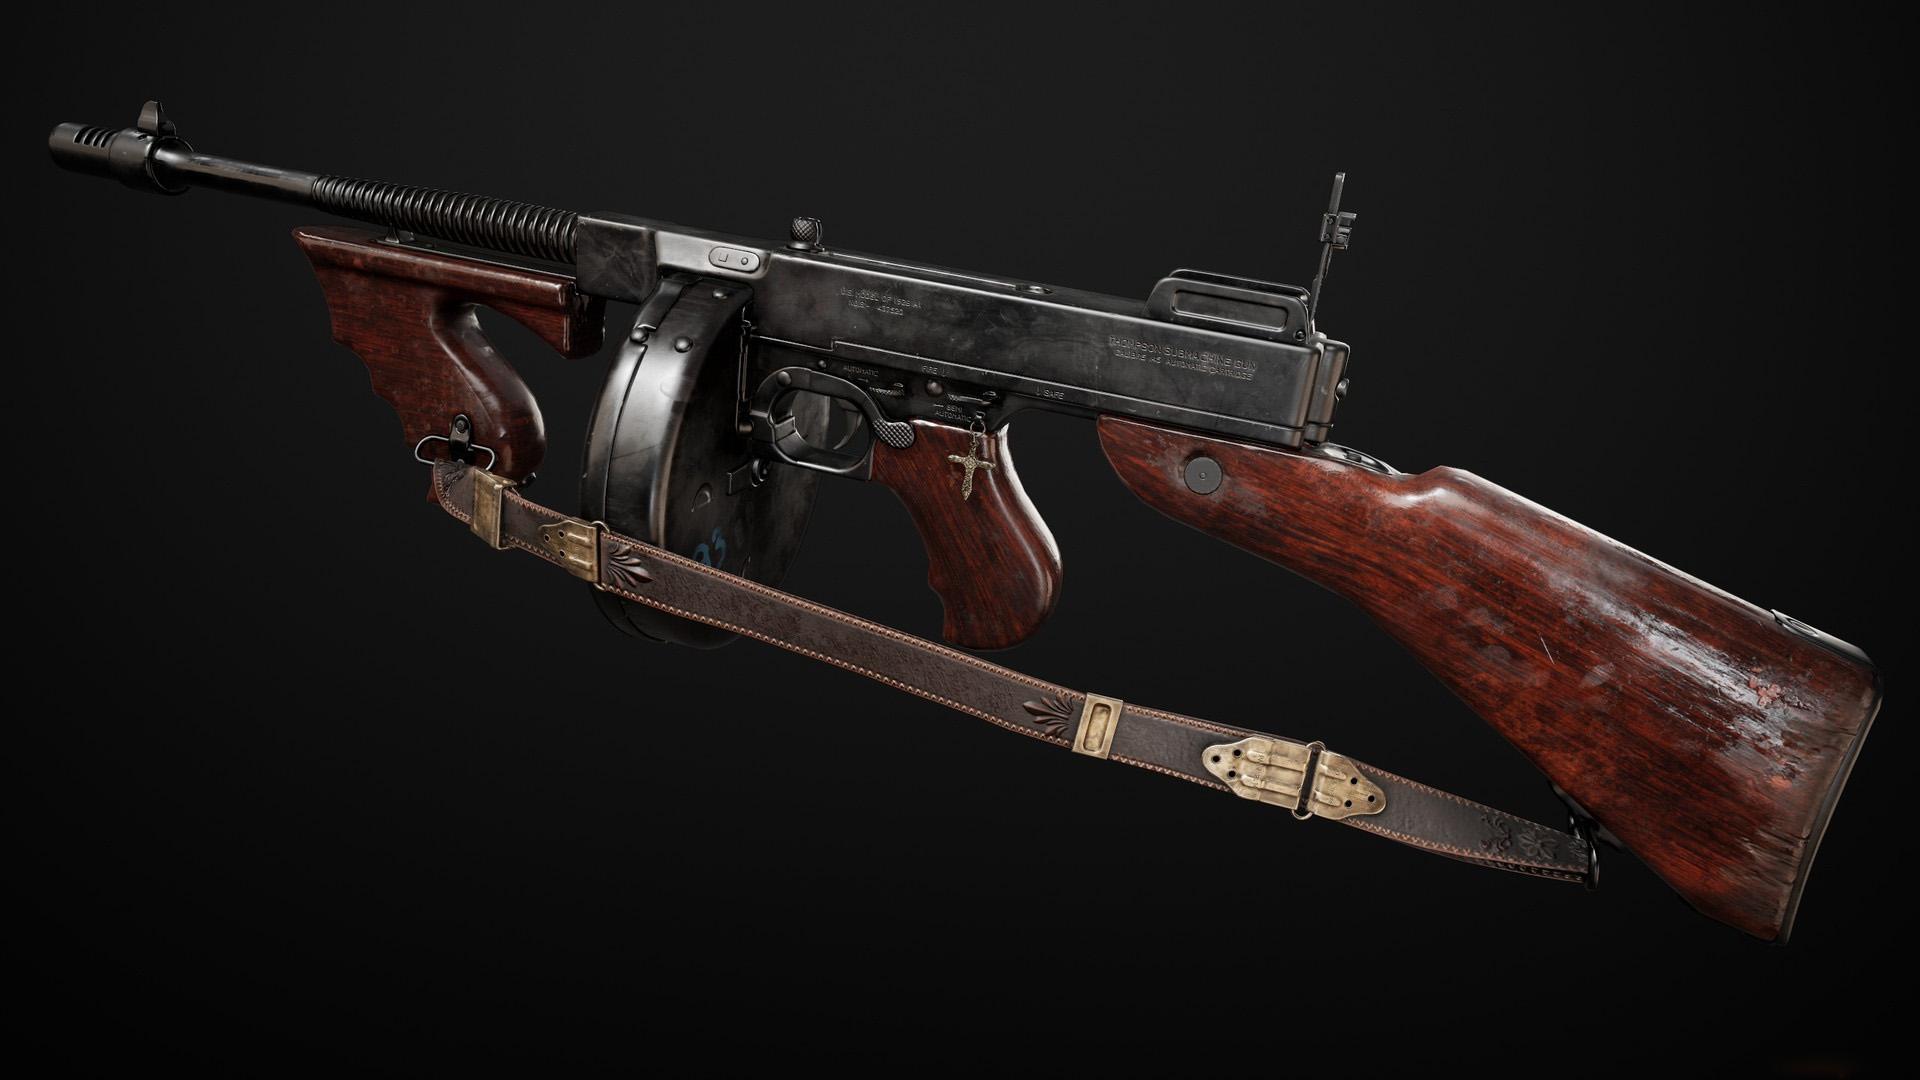 Автомат Томпсона, Gun thompson m1928, оружие фото обои, 1920 на 1080 пикселей